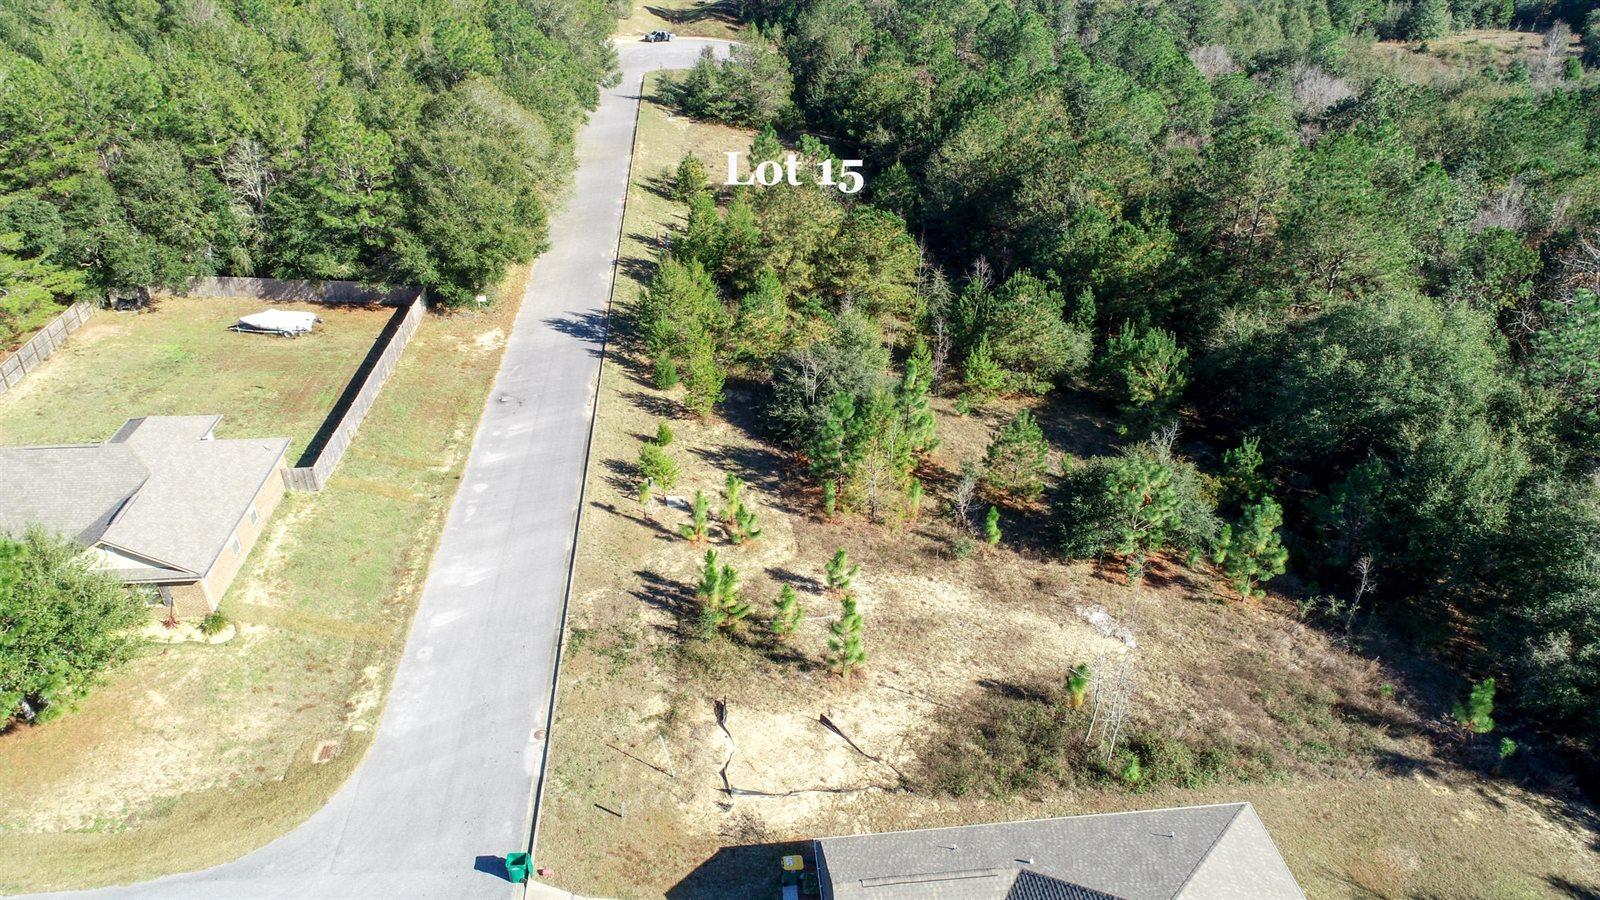 Lot 15 Wild Hare Ln, Crestview, FL 32539